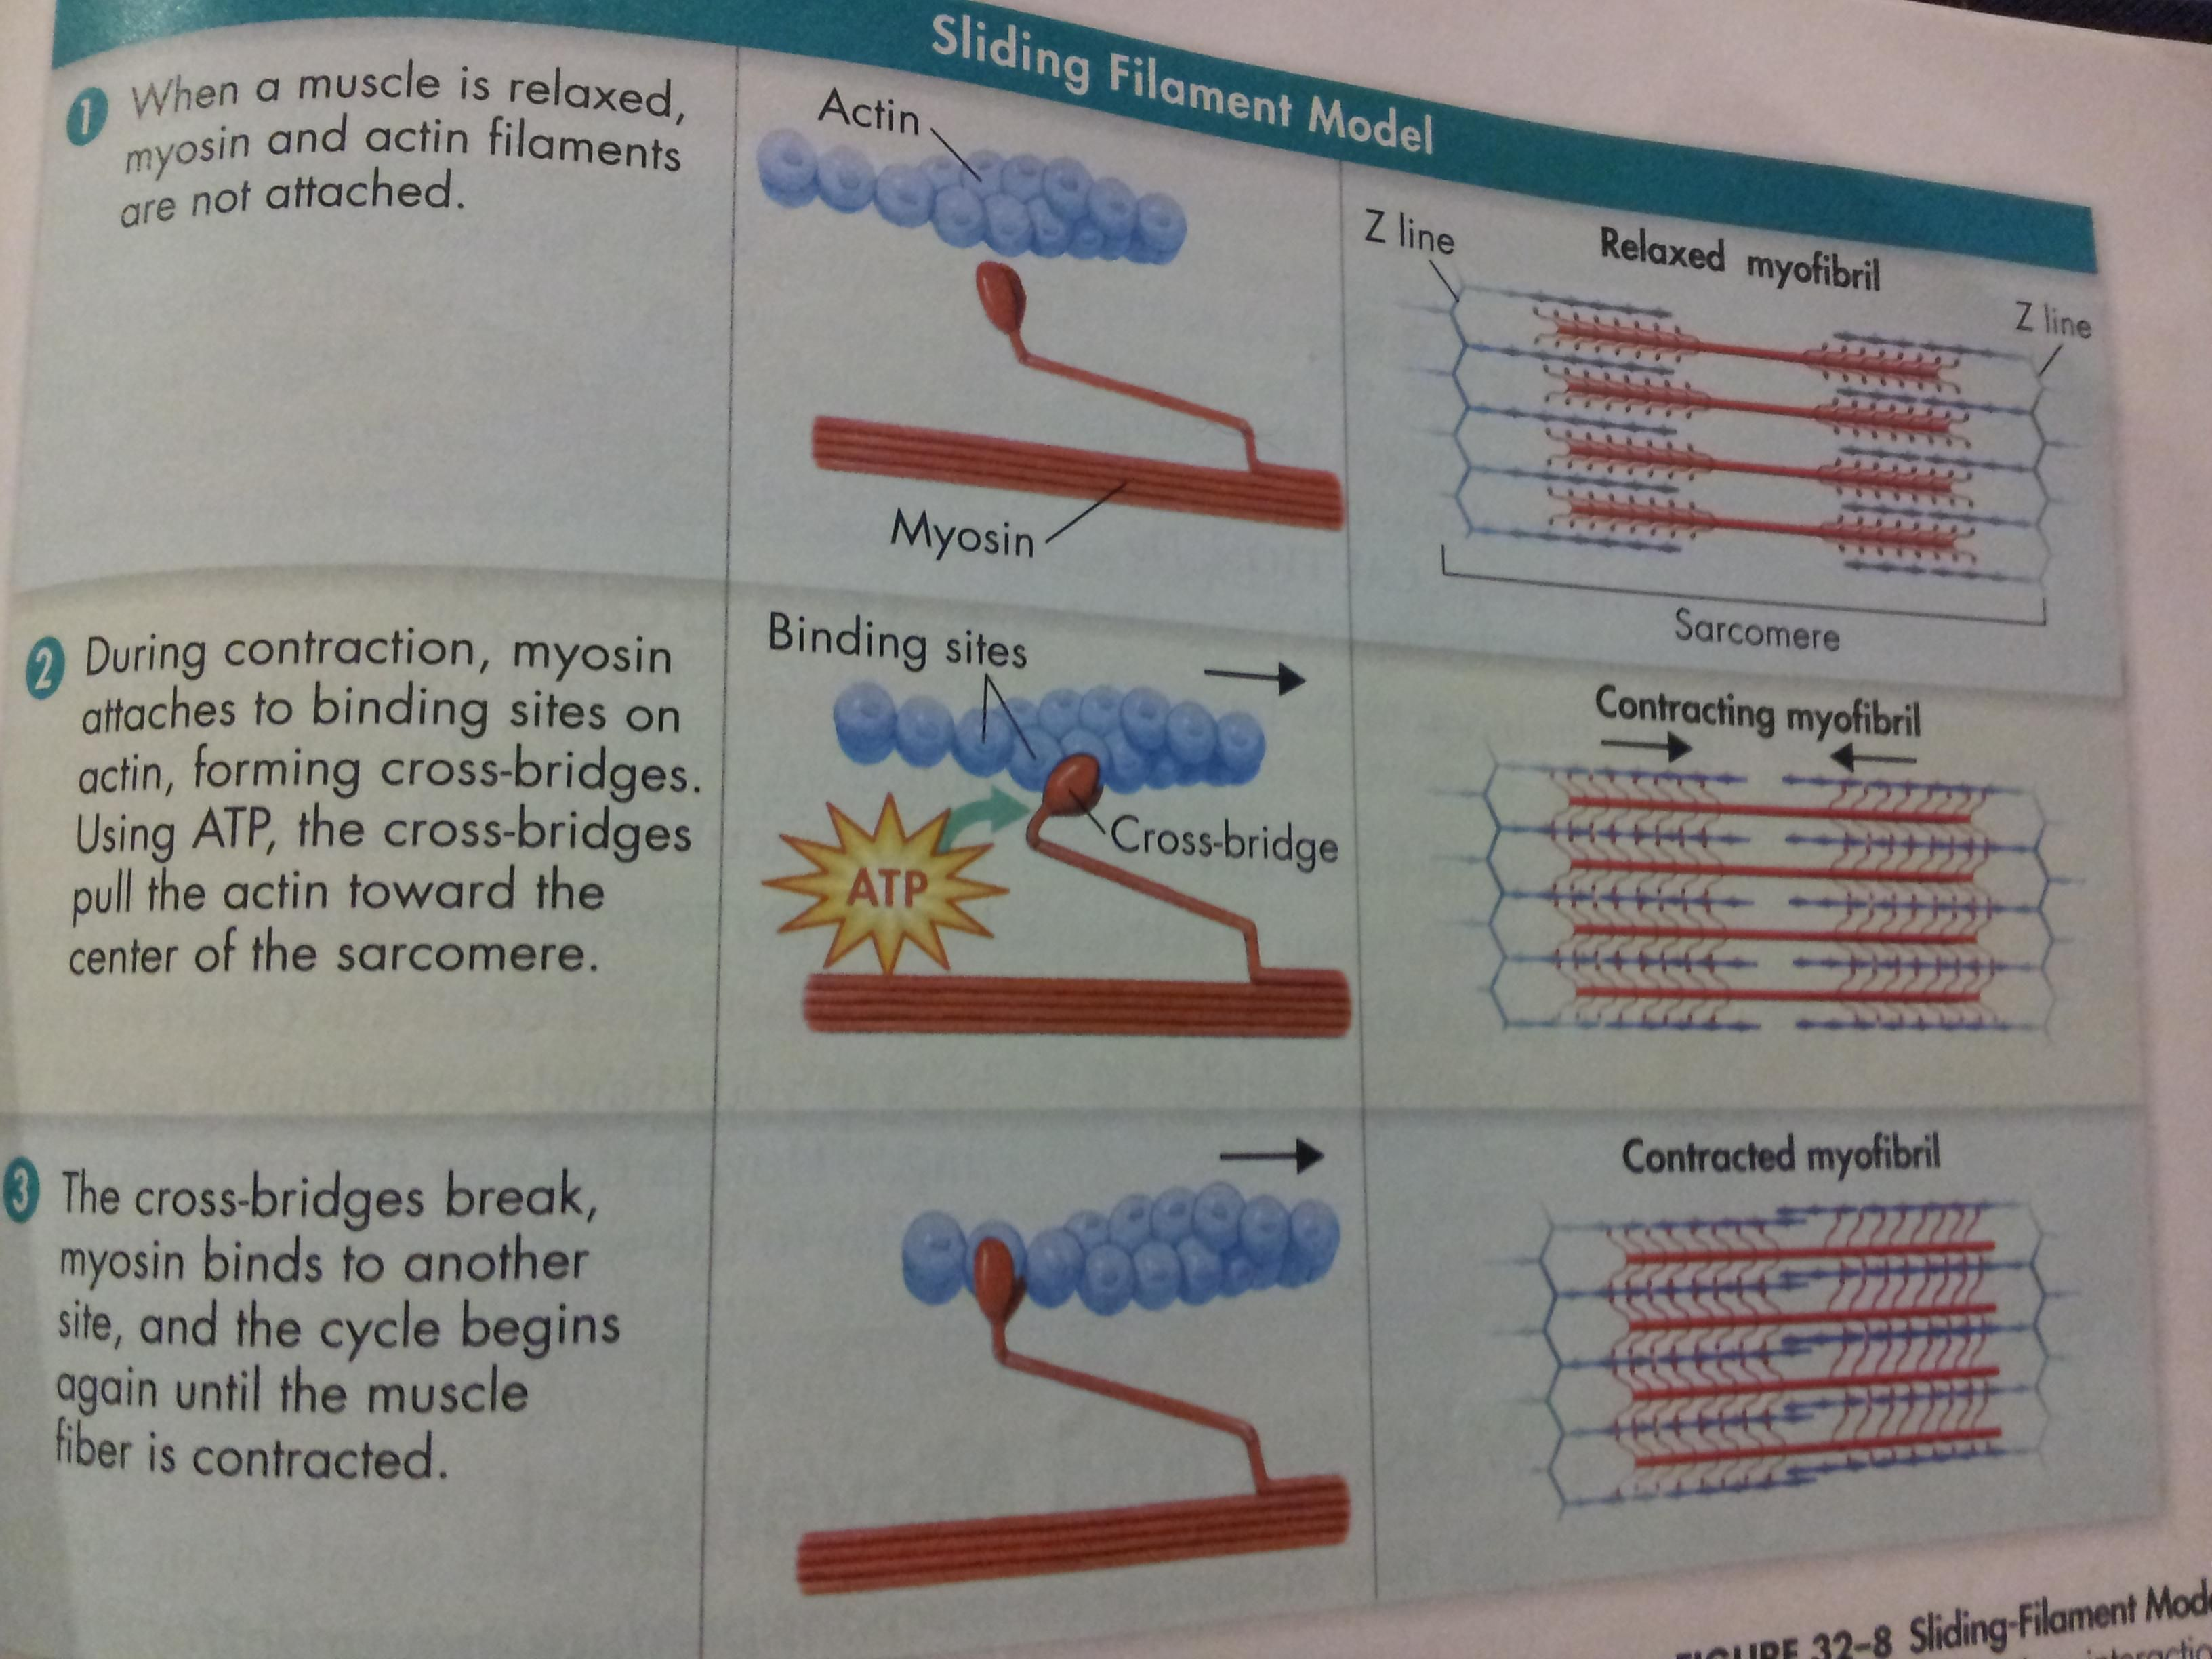 Myosin Myofilaments | myofilaments slide over myosin to shorten ...